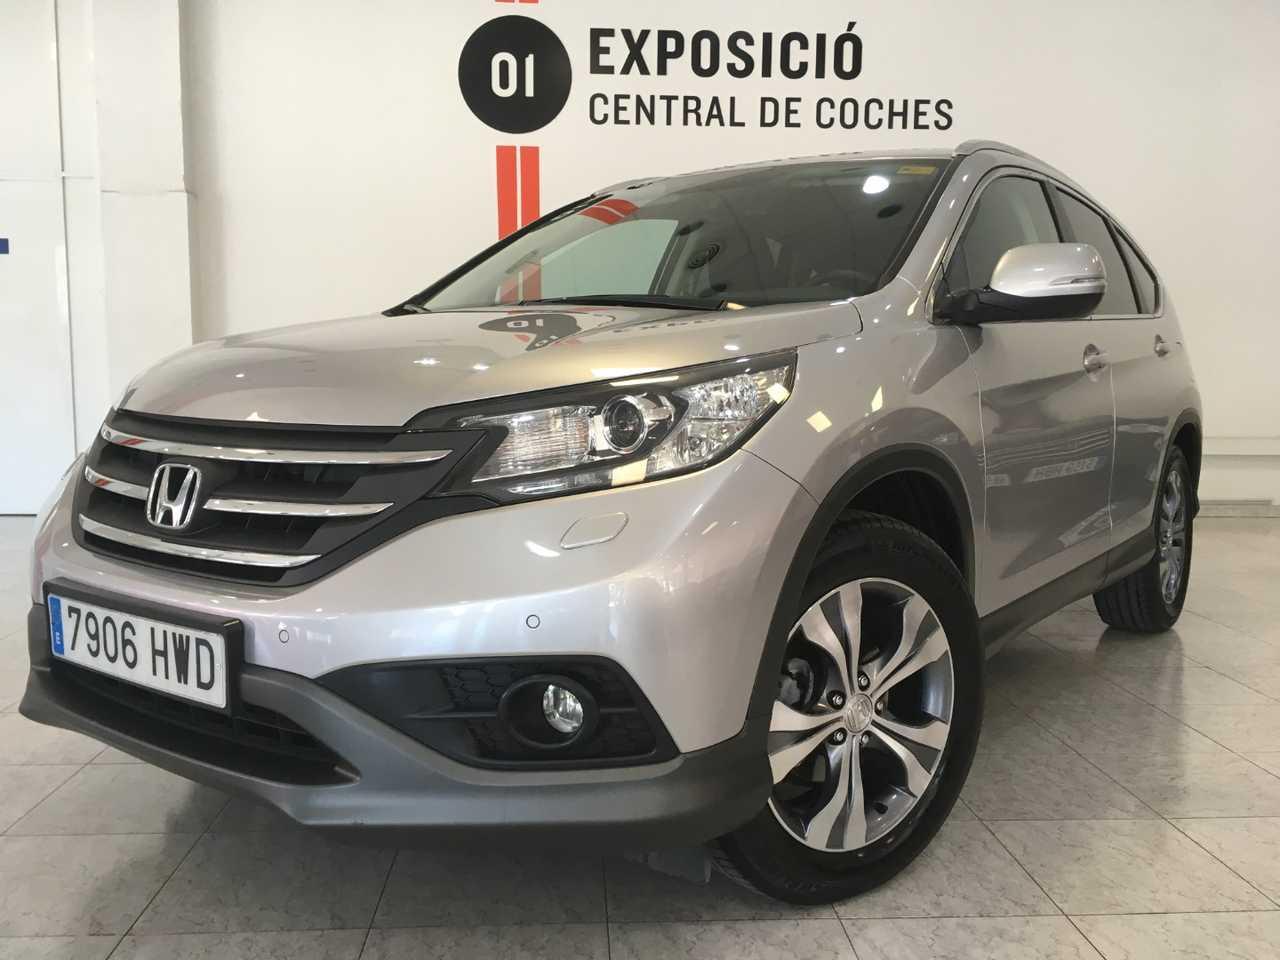 Honda CR-V 2.0 I-VTEC 4x4 Lifestyle / Xenon / Alcantara calefac. / Parktronic   - Foto 1